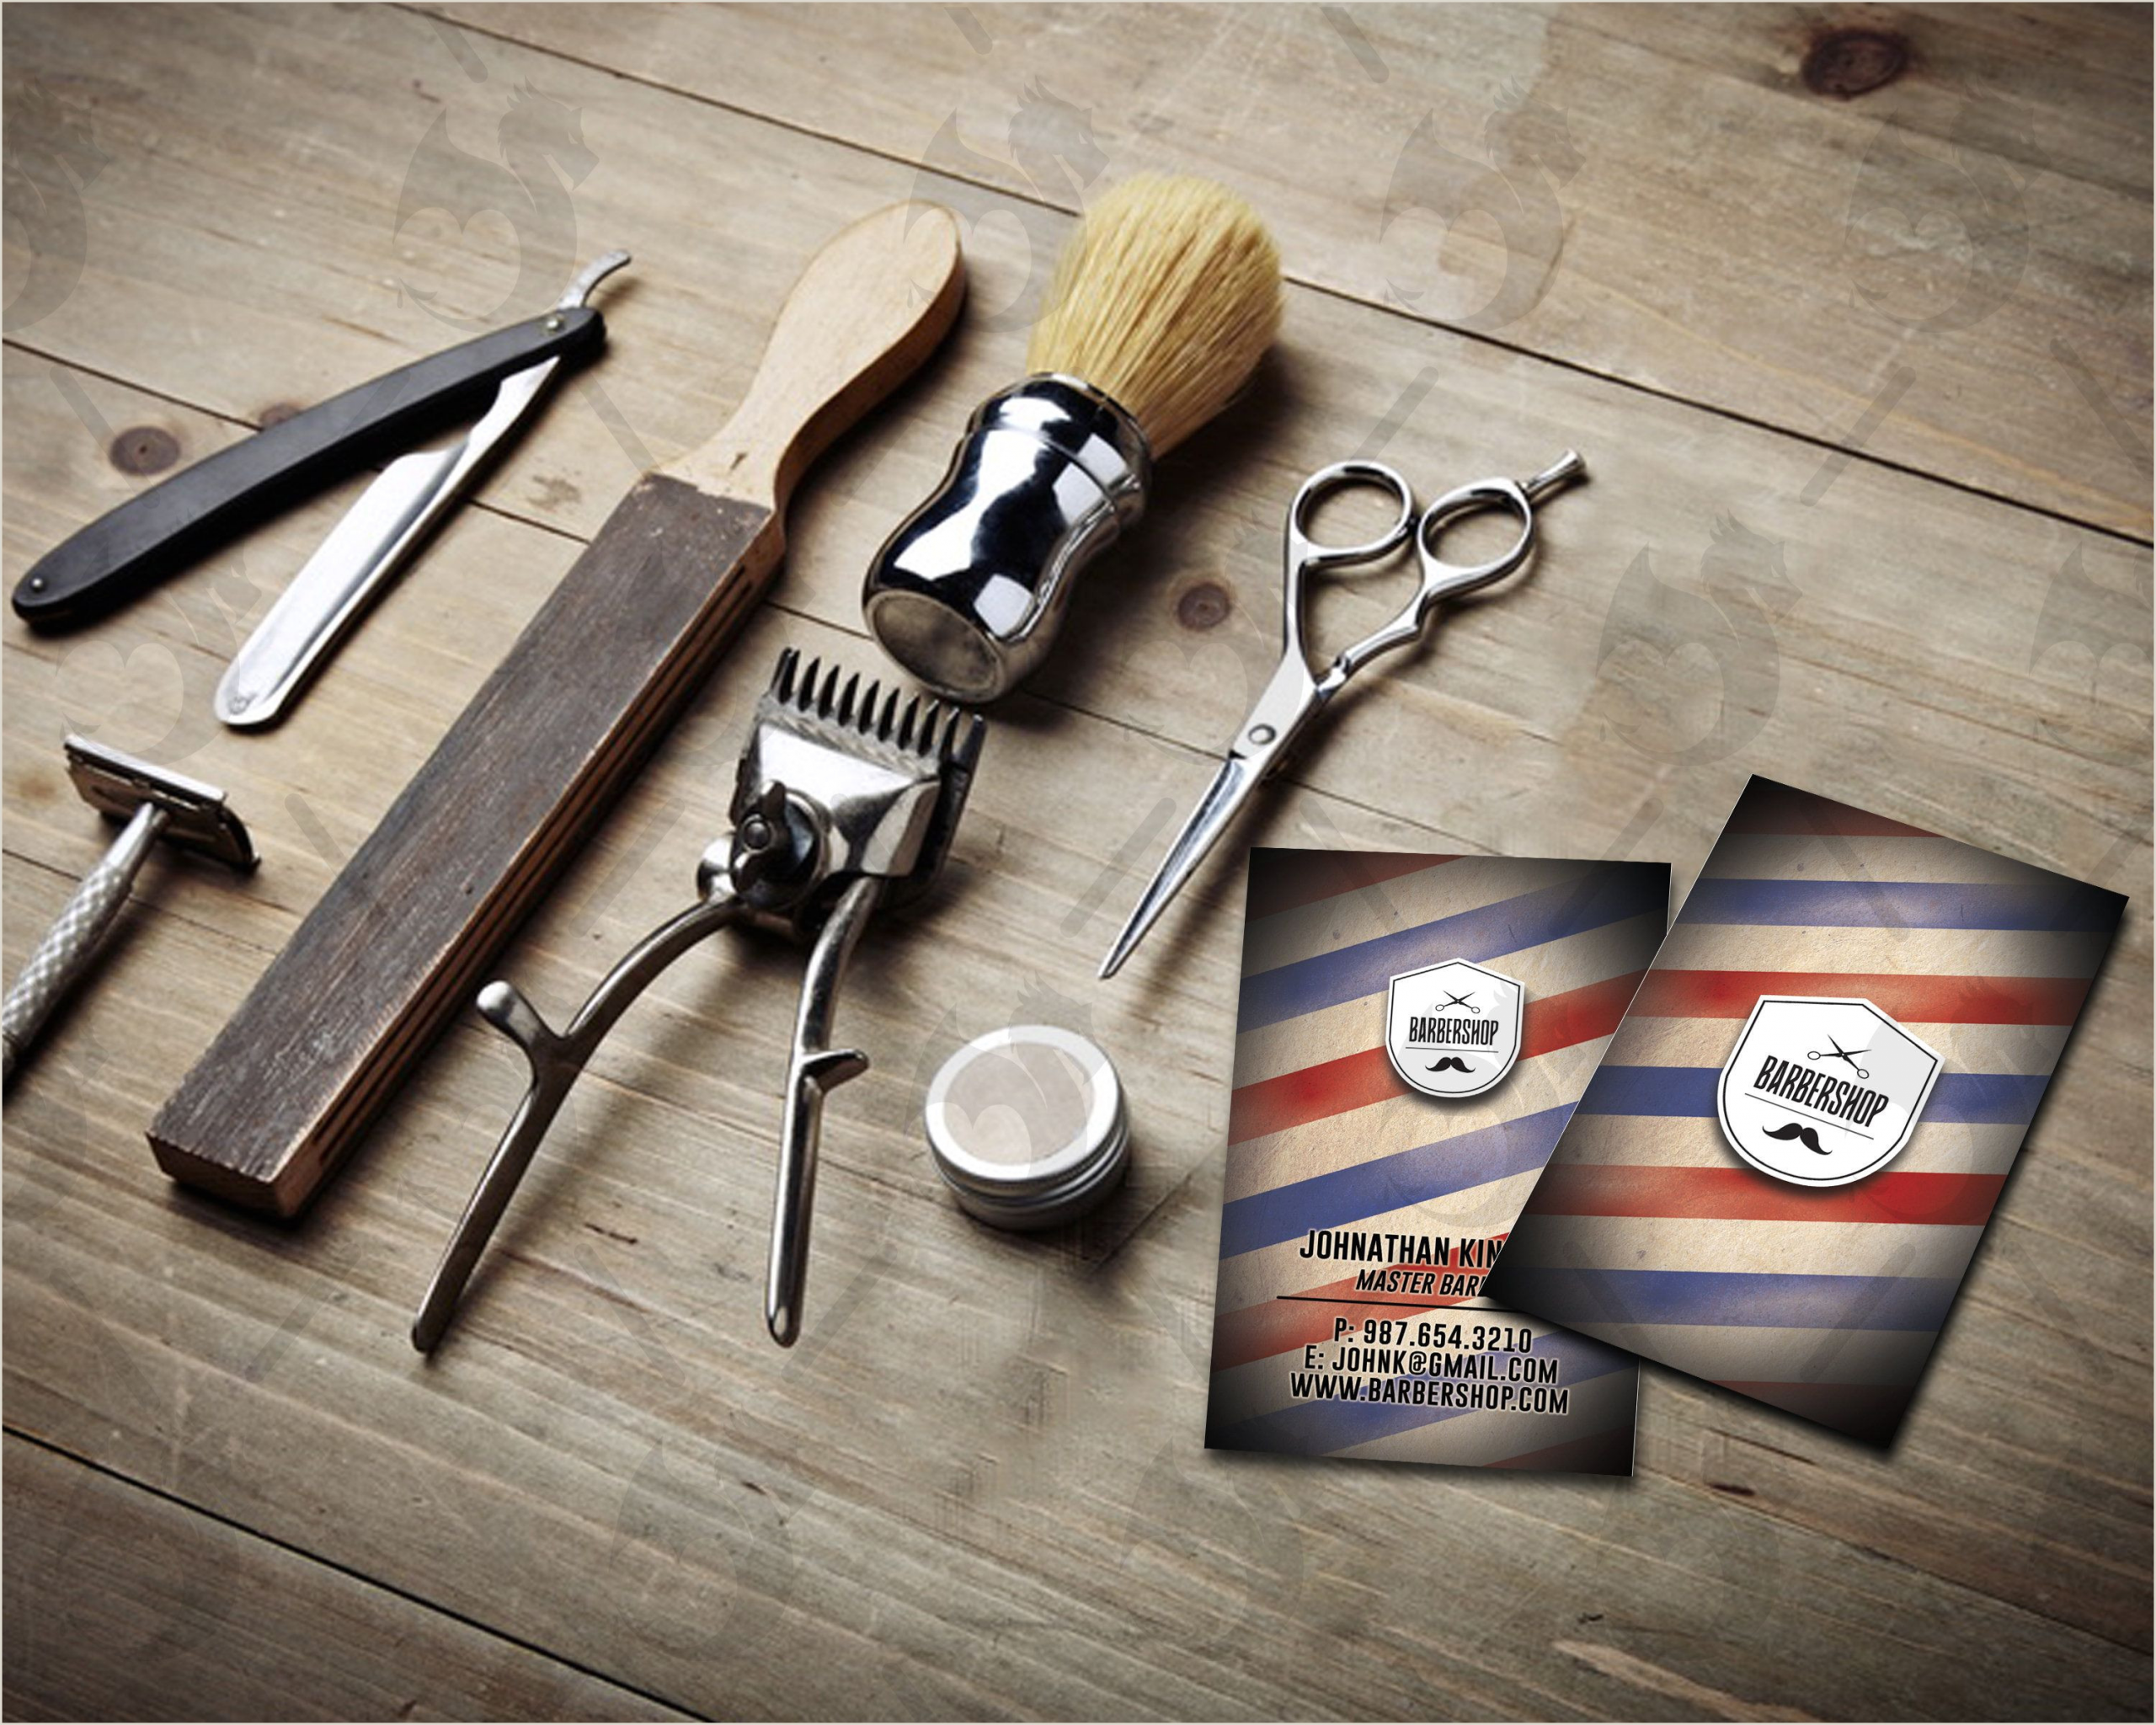 Unique Shaped Business Cards Barber Pole Barber Shop Business Cards Vintage Business Card Barber